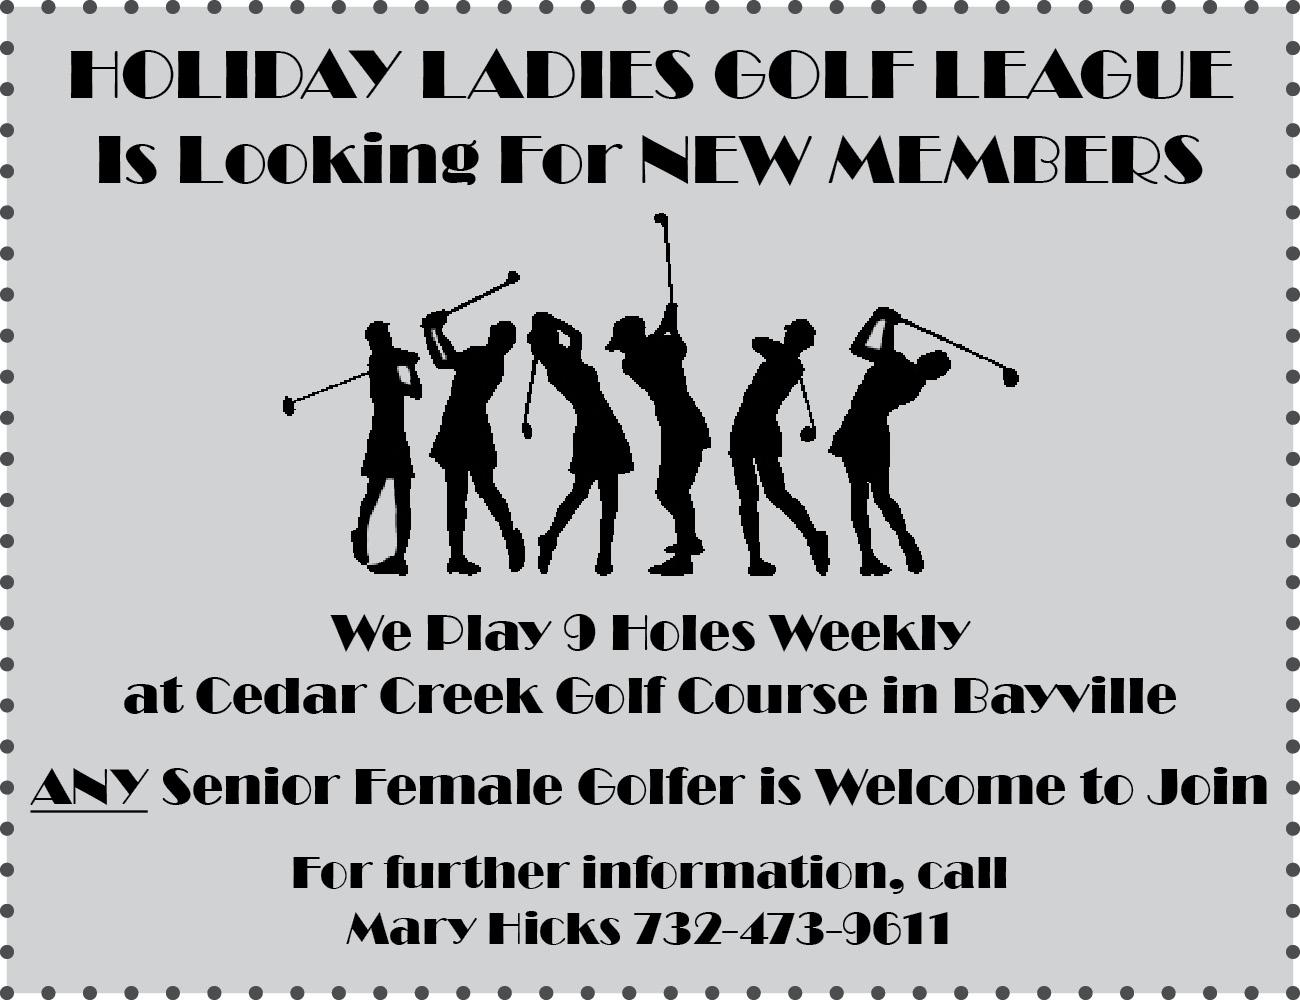 Ladies golf league